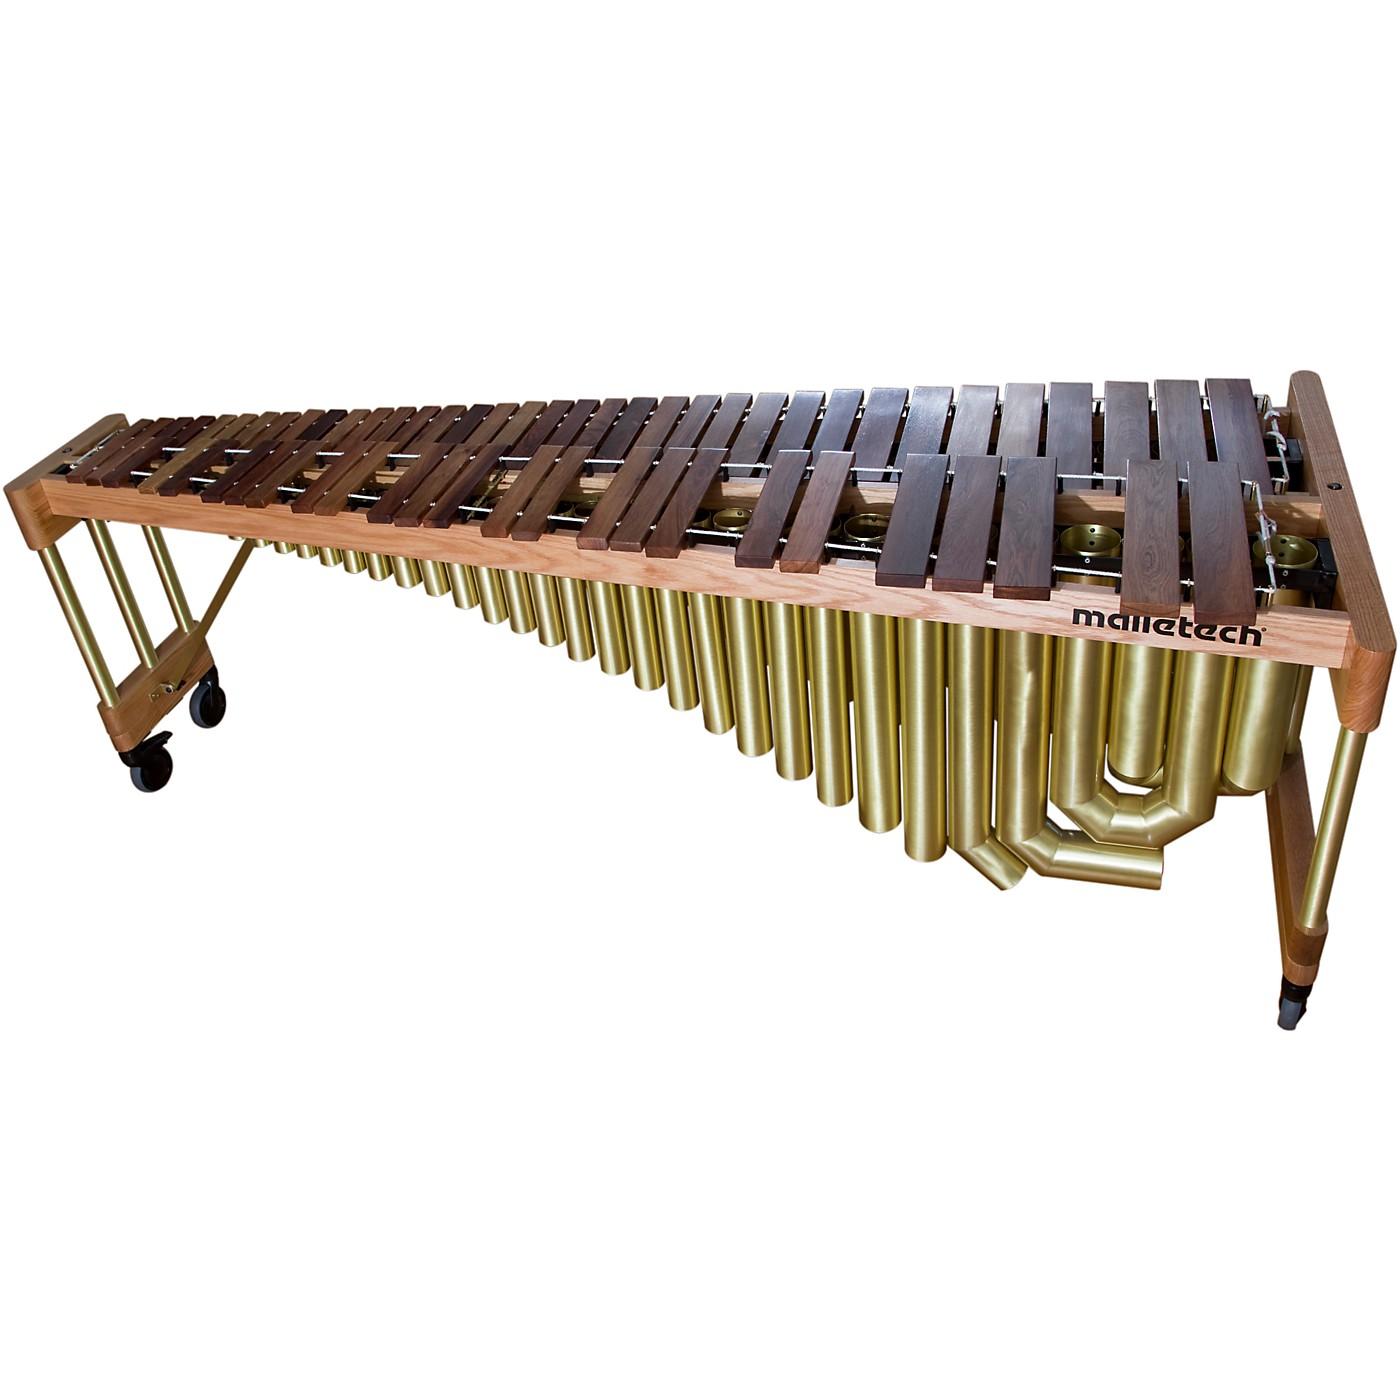 Malletech 5.0 Imperial Grand Marimba thumbnail